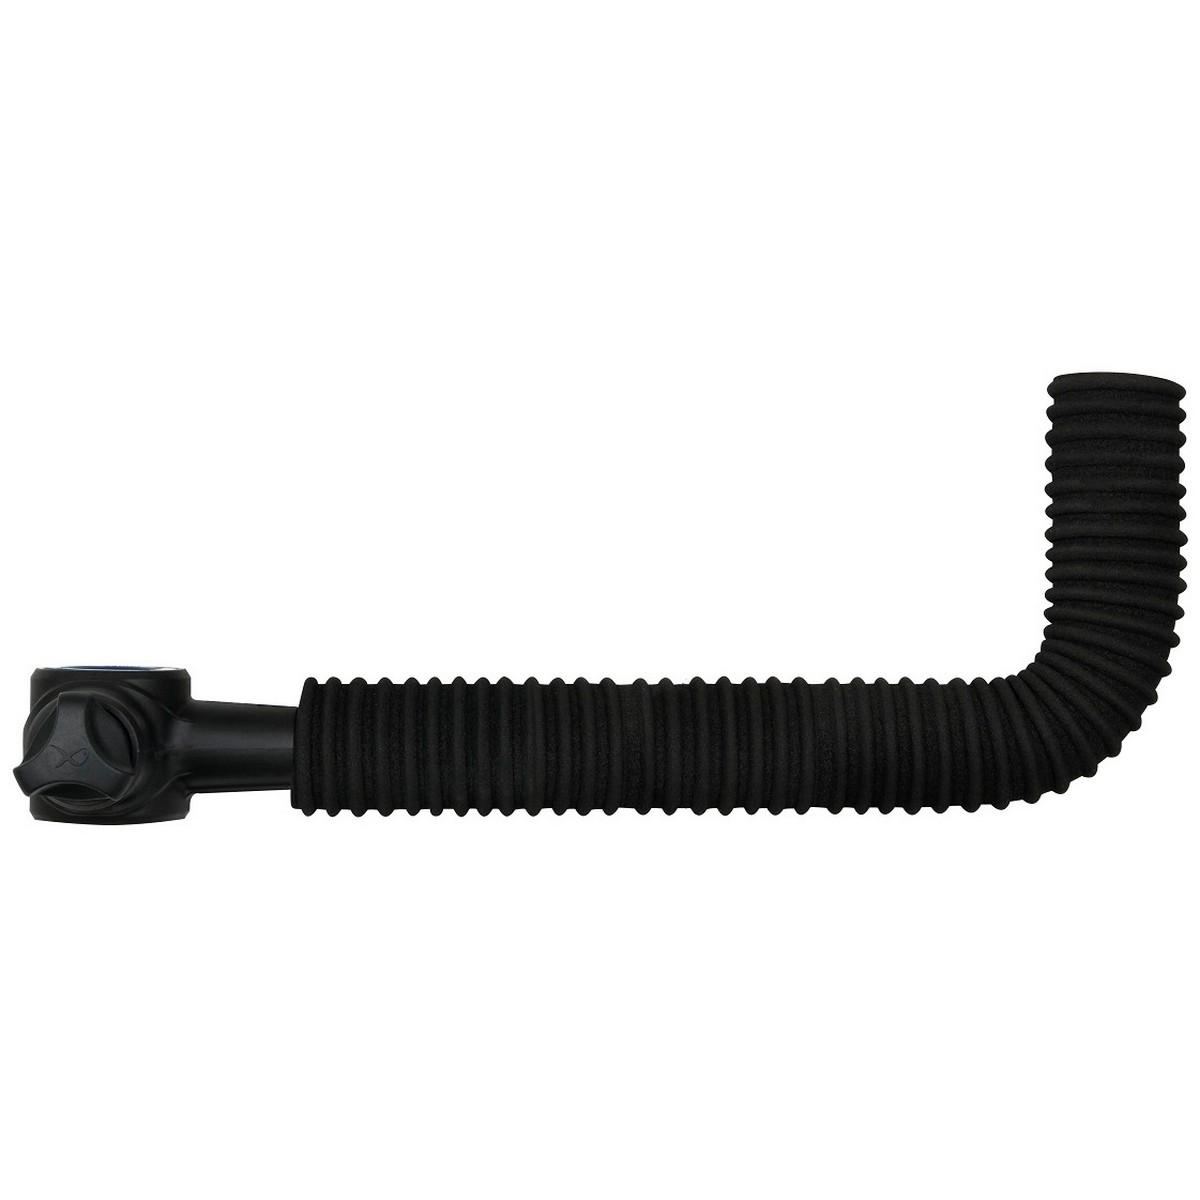 Прикачна за платформа Matrix 3D Protector Bar Long - универсално рамо